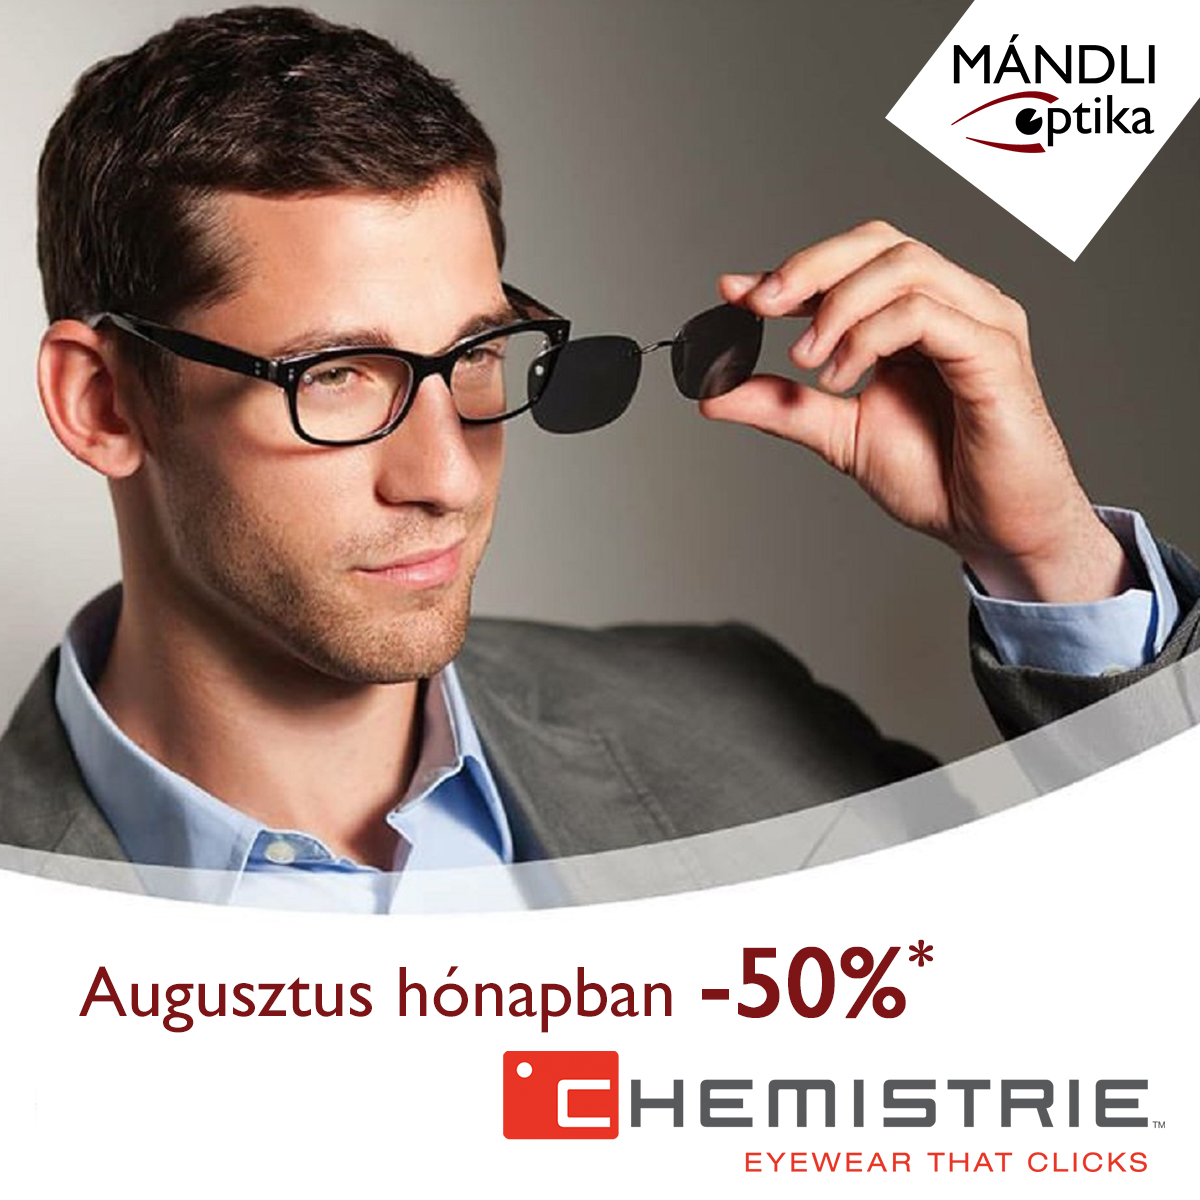 Mandli_optika_szombathely_Hoya_Chemistrie_clip-on_akcio_banner_1200x1200